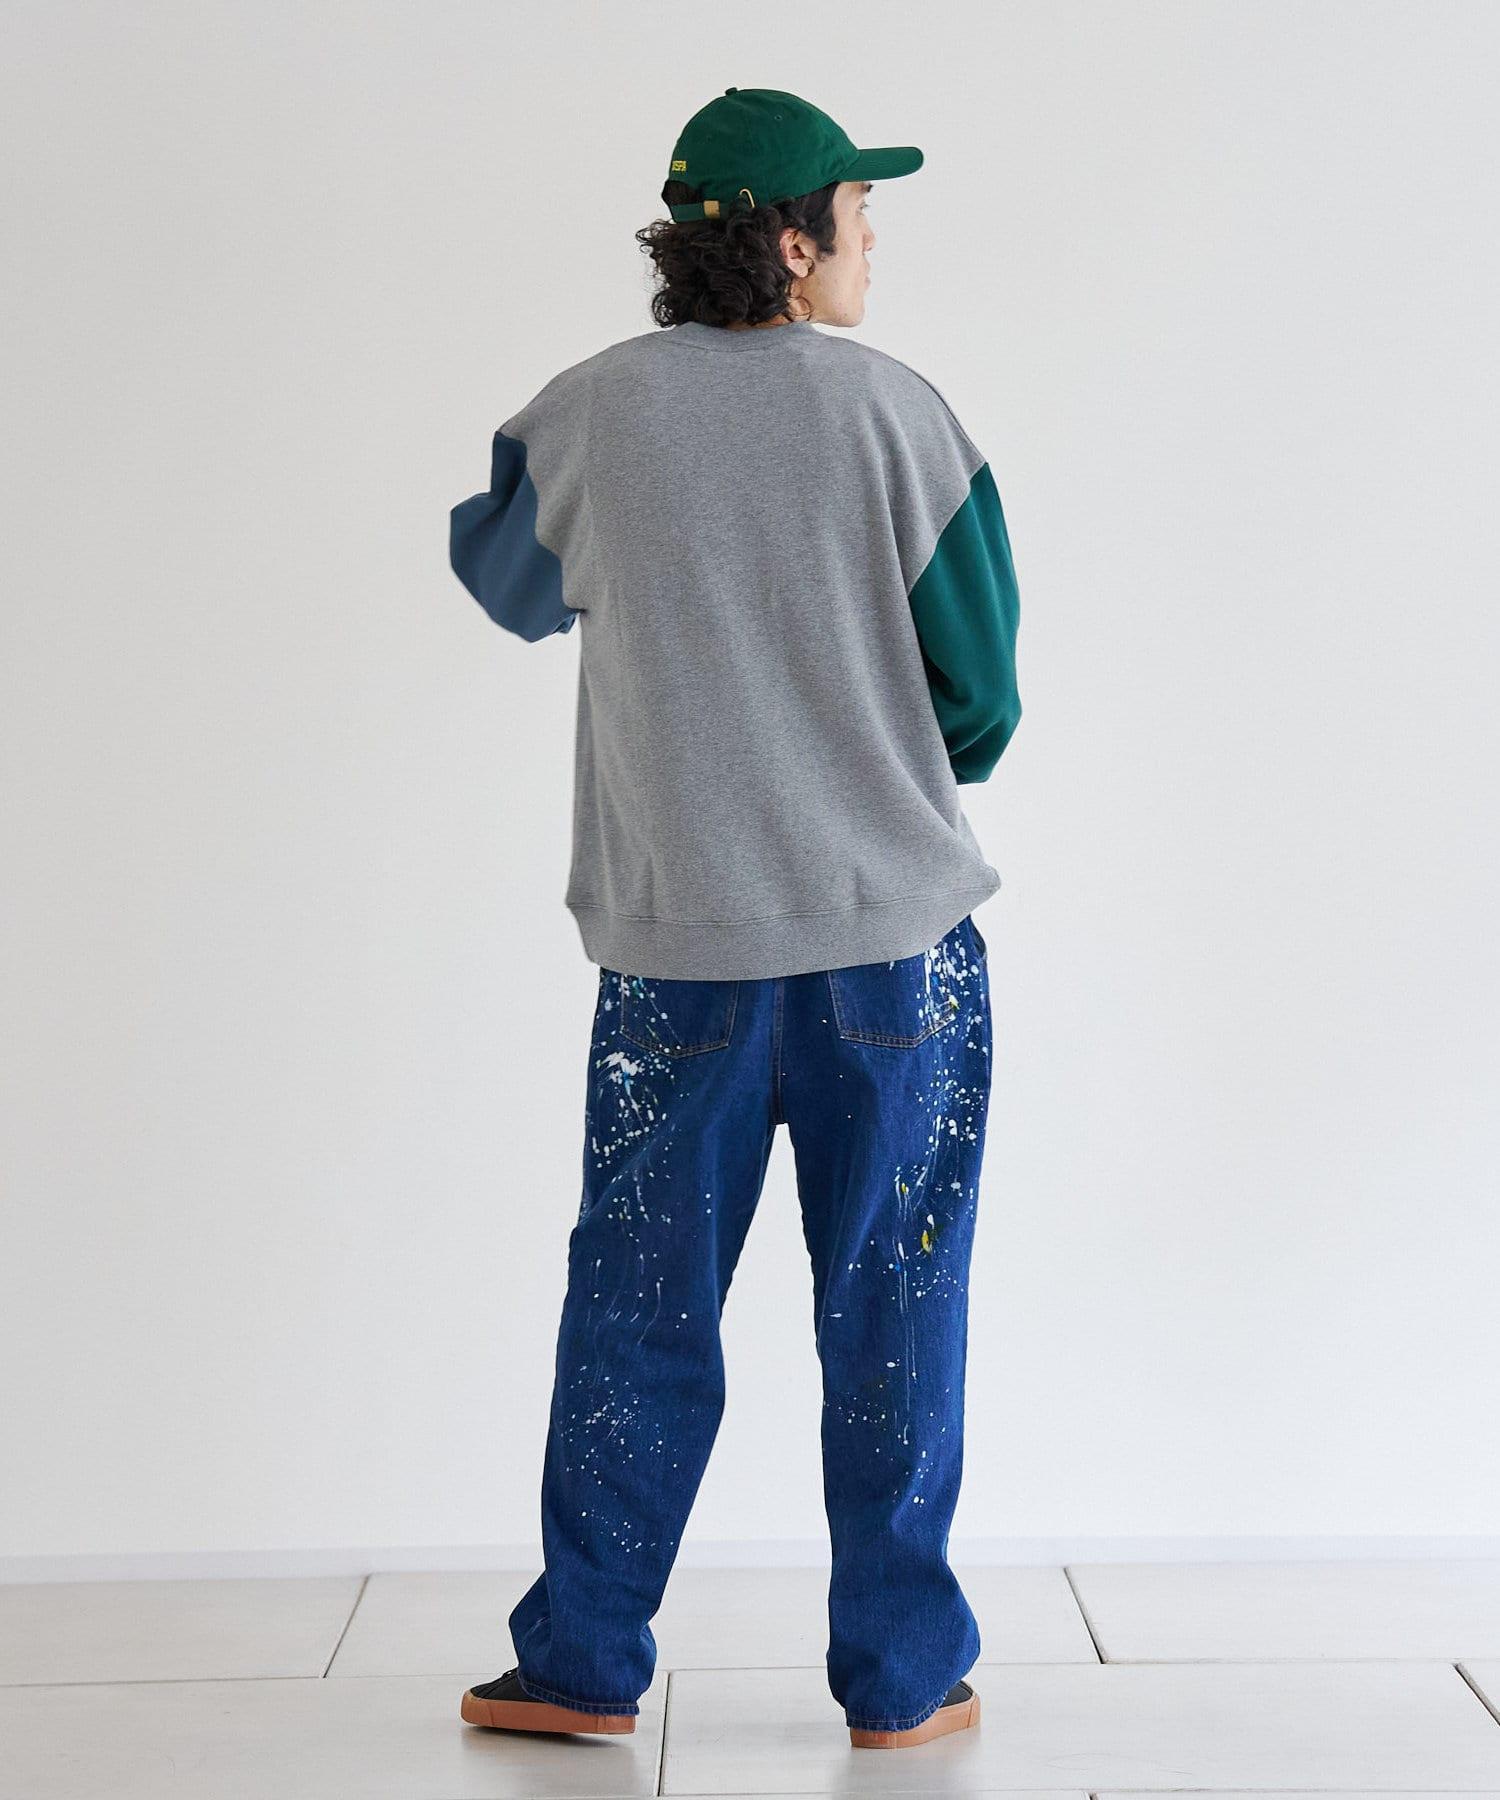 CPCM(シーピーシーエム) アップリケ刺繍カレッジ裏毛プルオーバー